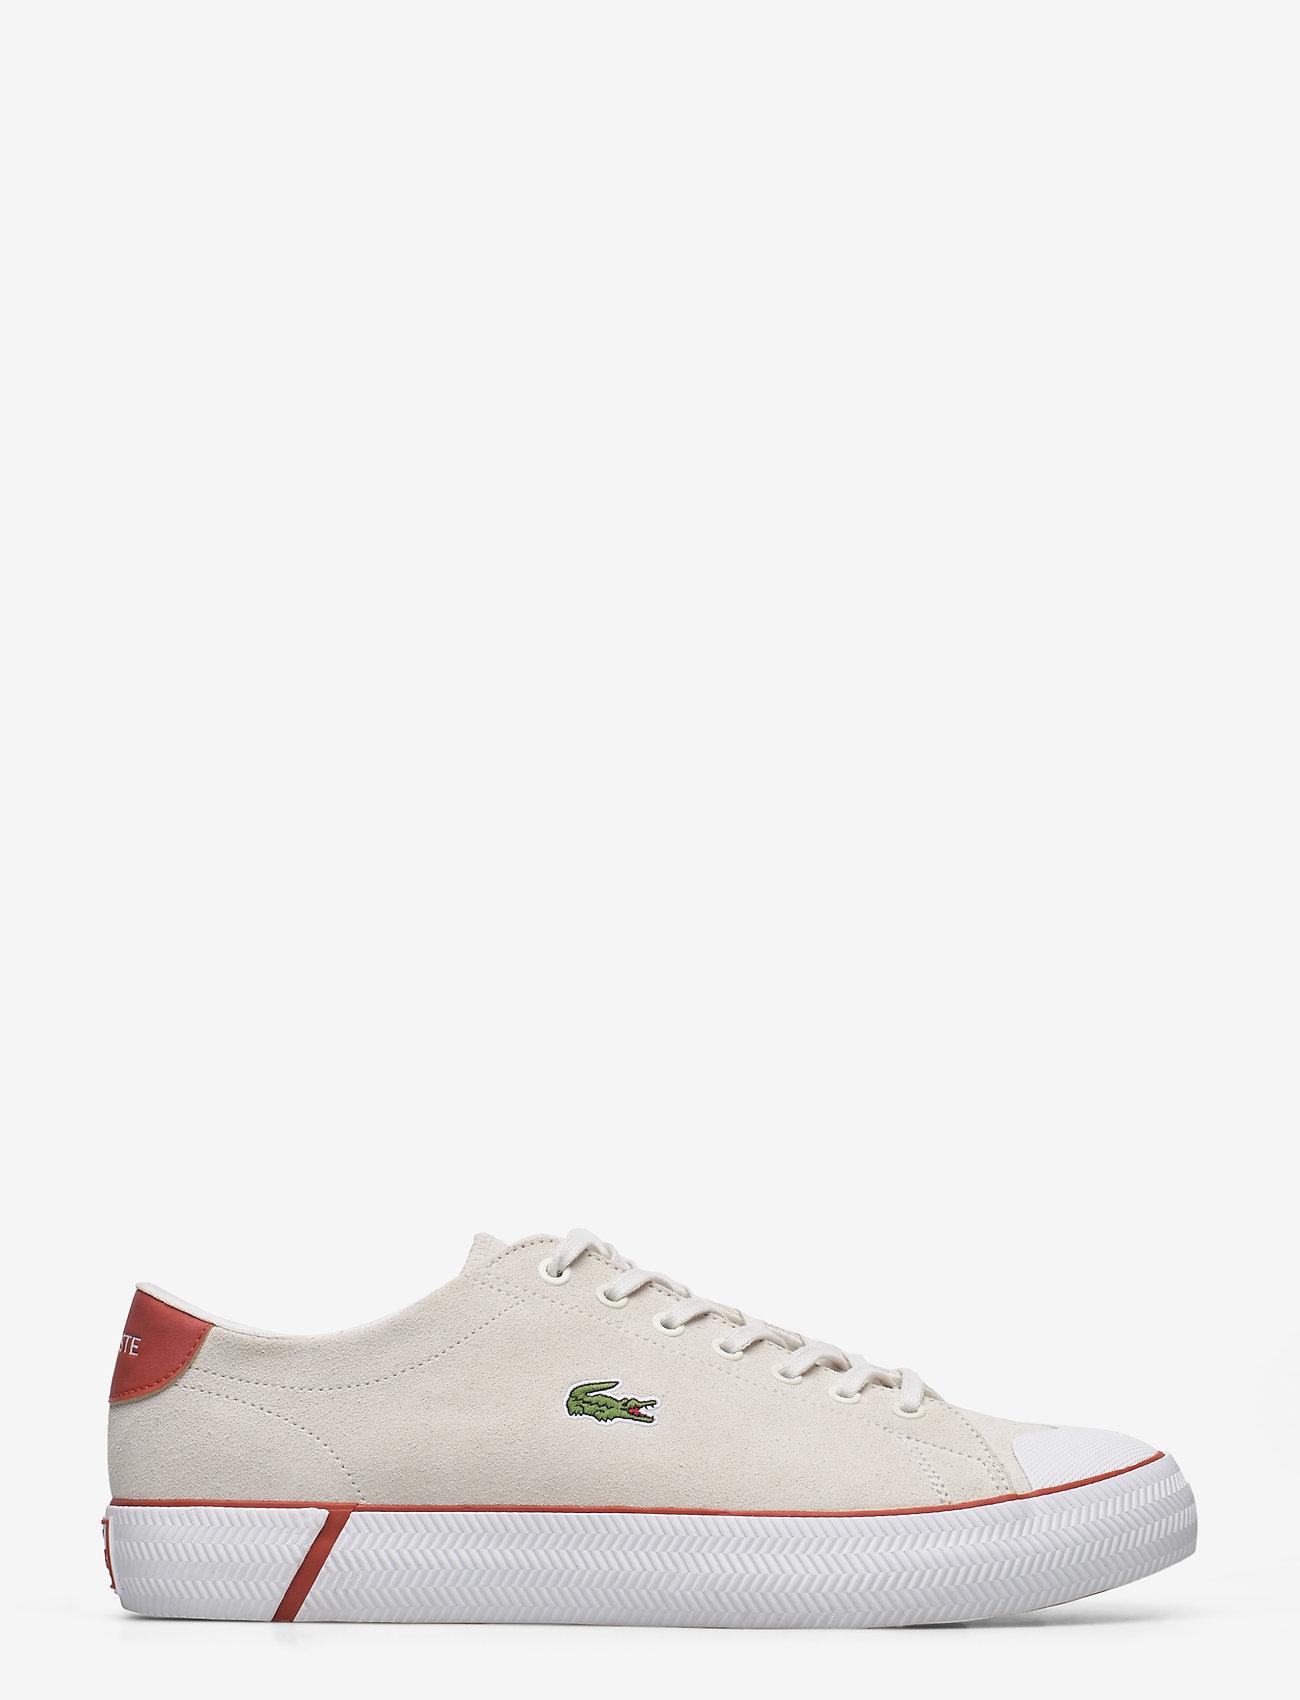 Lacoste Shoes - GRIPSHOT 120 1 CMA - przed kostkę - off wht/org sde - 1